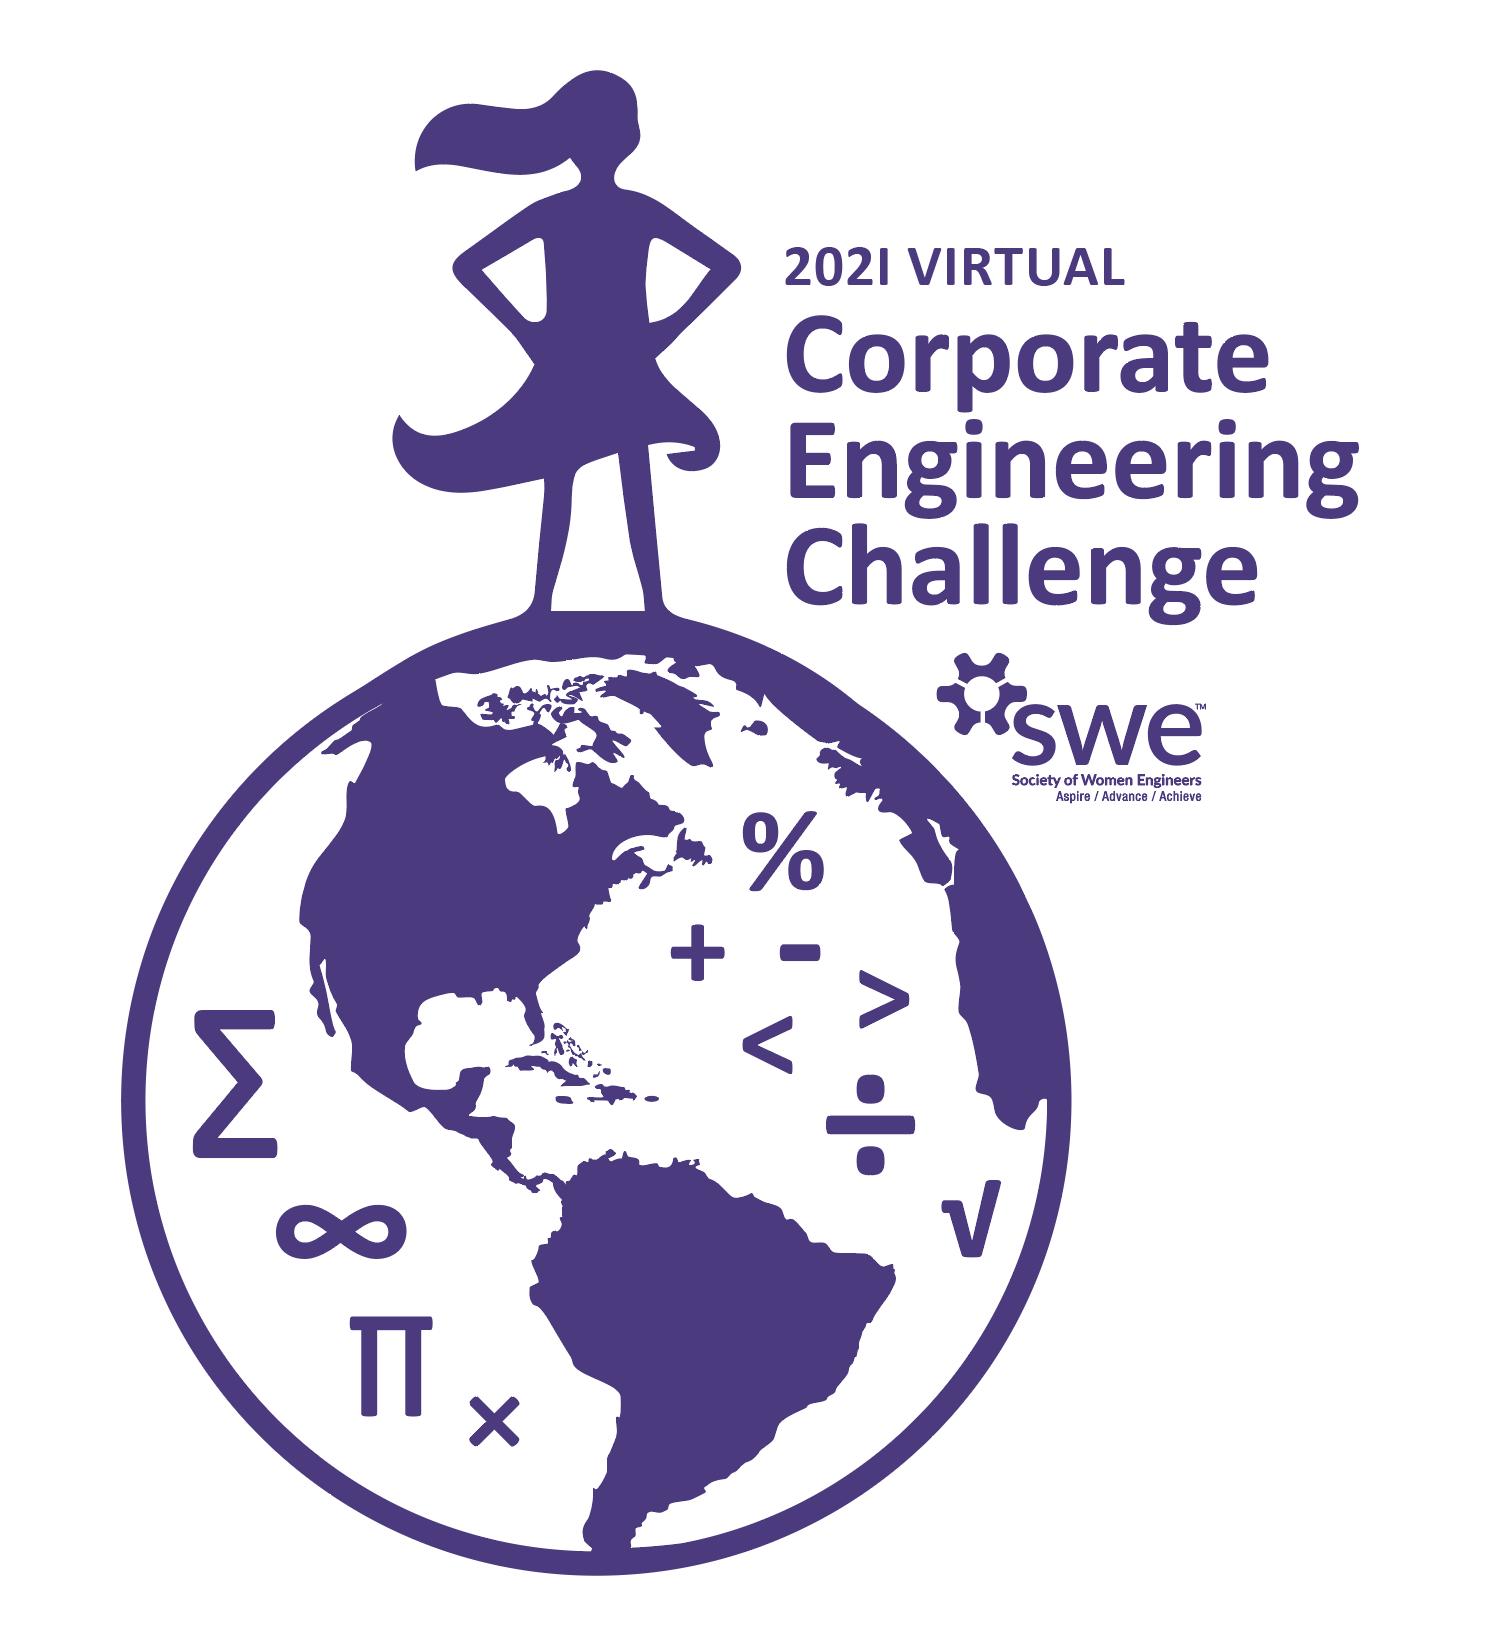 Virtual Corporate Engineering Challenge!